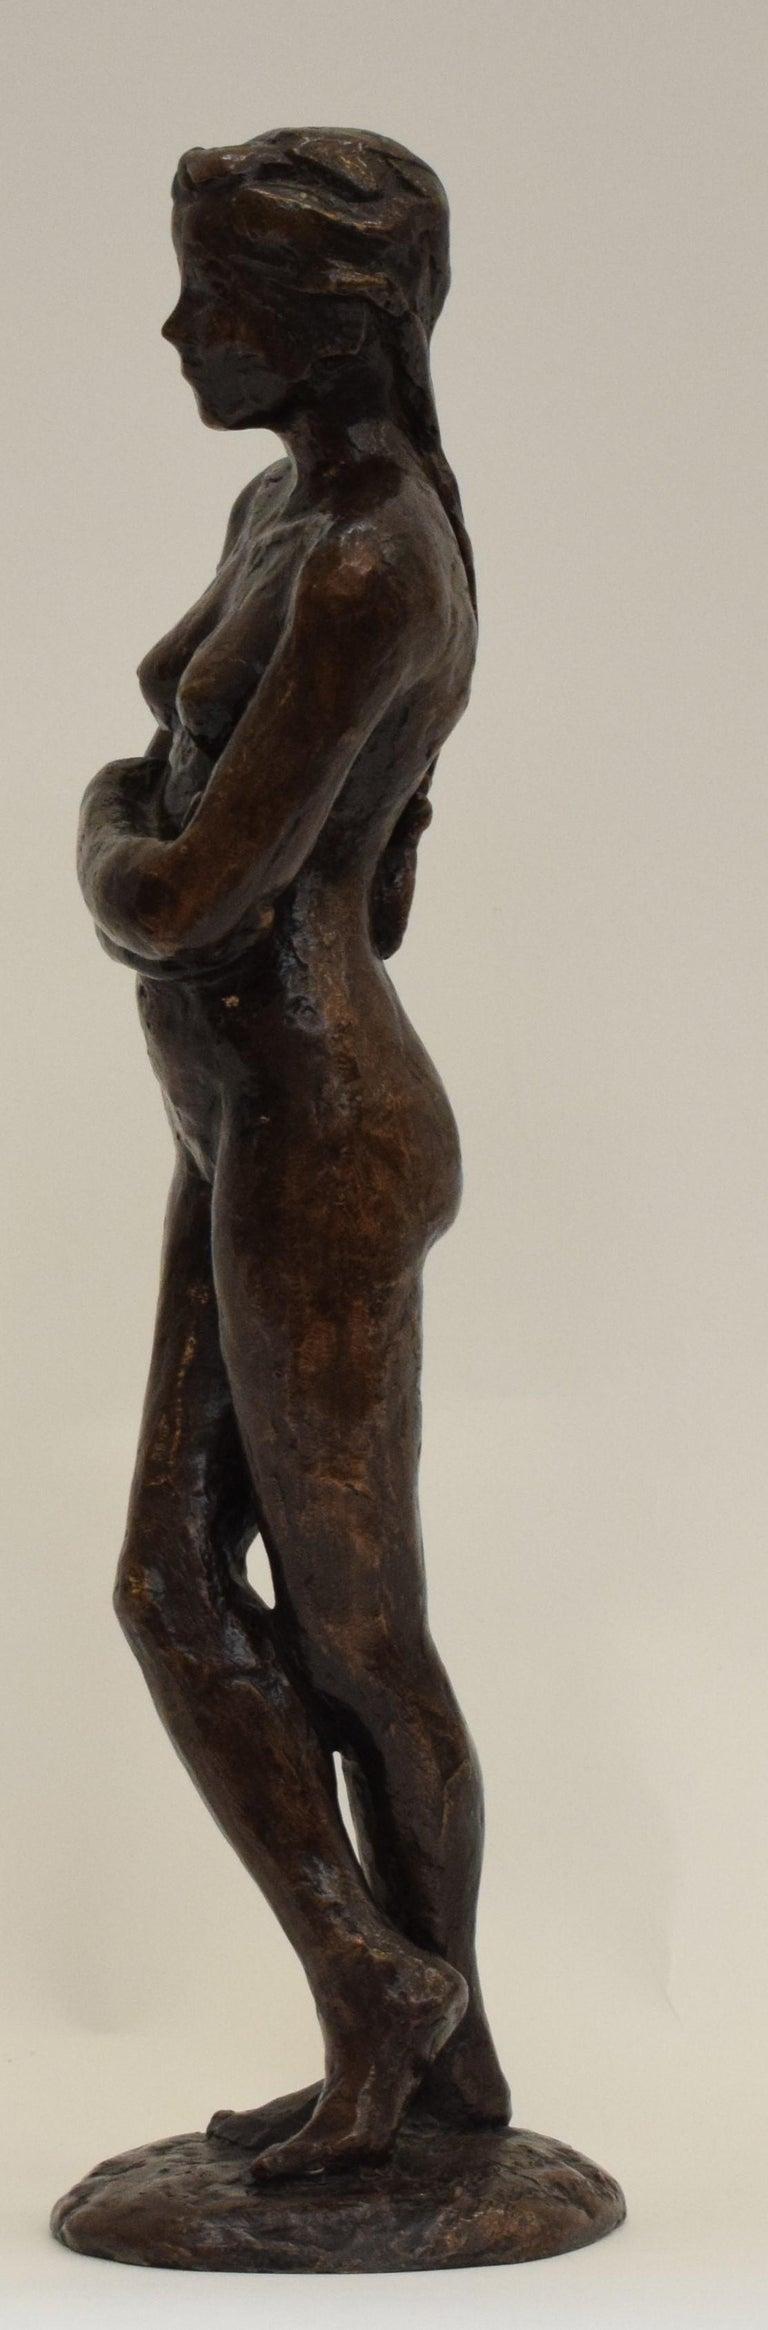 Bronze statue of a woman, Anneke Hei - Degenhardt (1951), Signed - Sculpture by Anneke Hei-Degenhardt